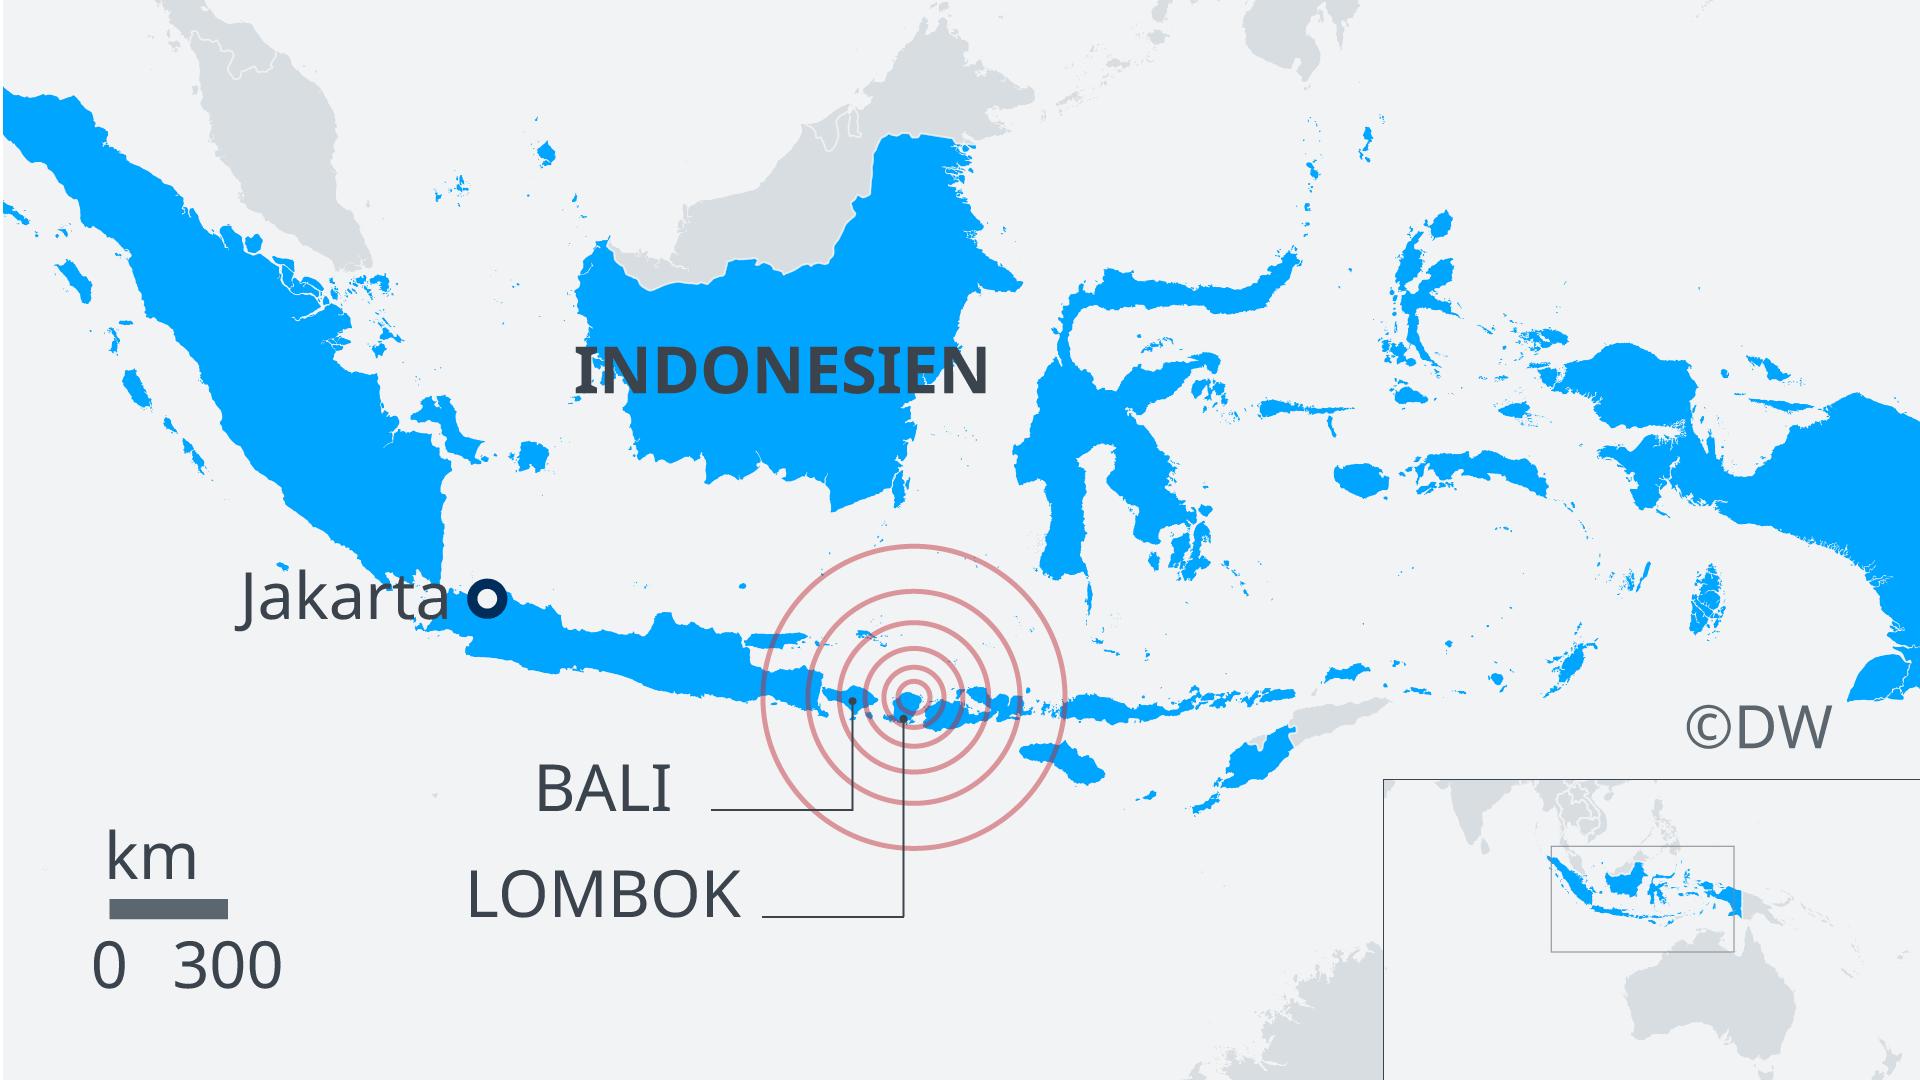 Erdbeben Deutschland Karte.Erdbeben Erschuttert Indonesische Insel Lombok Aktuell